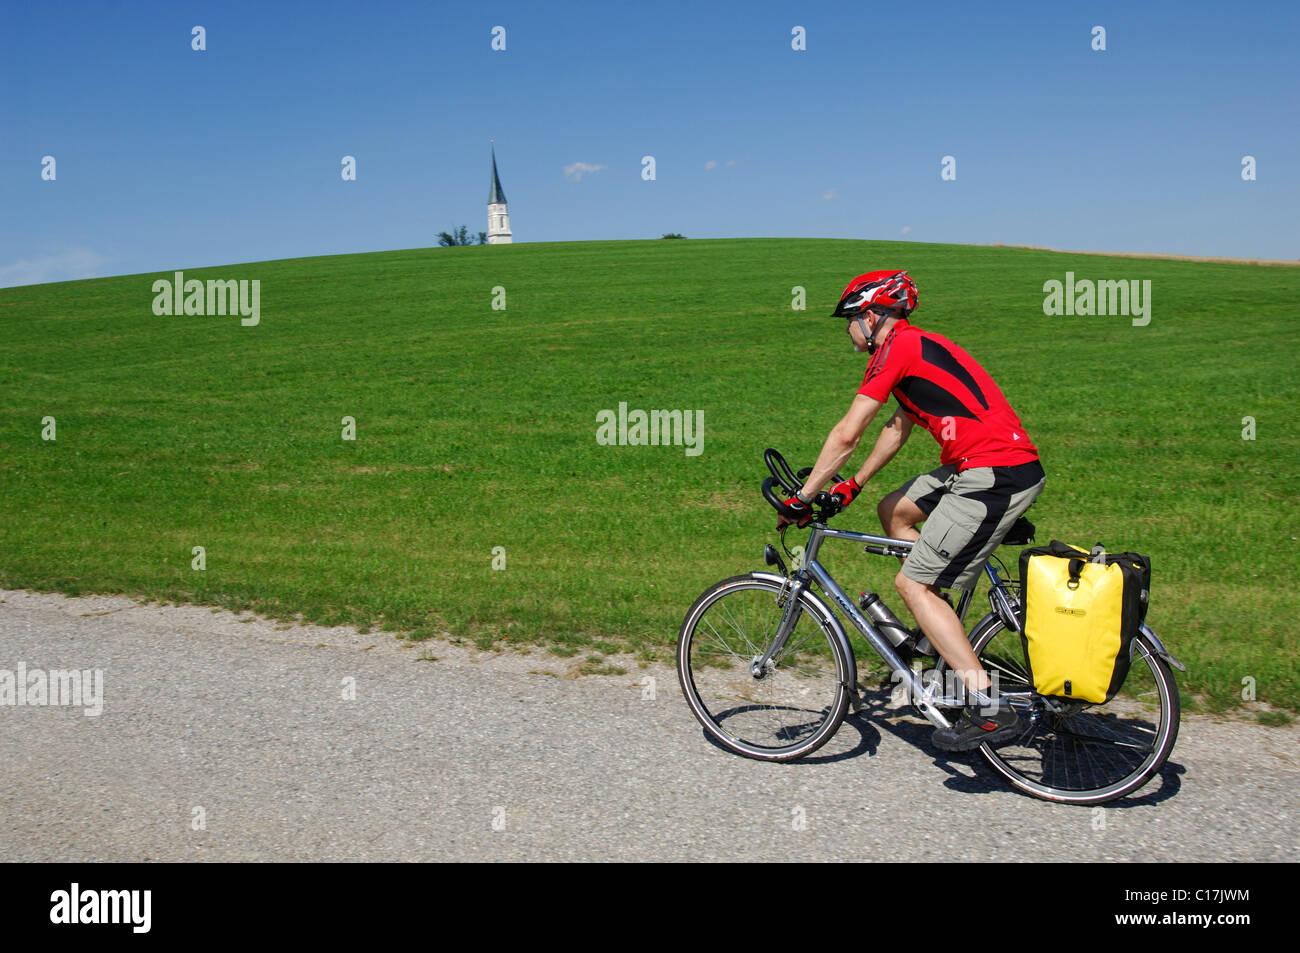 Bicyclist near Gars am Inn, Chiemgau, Bavaria, Germany, Europe - Stock Image